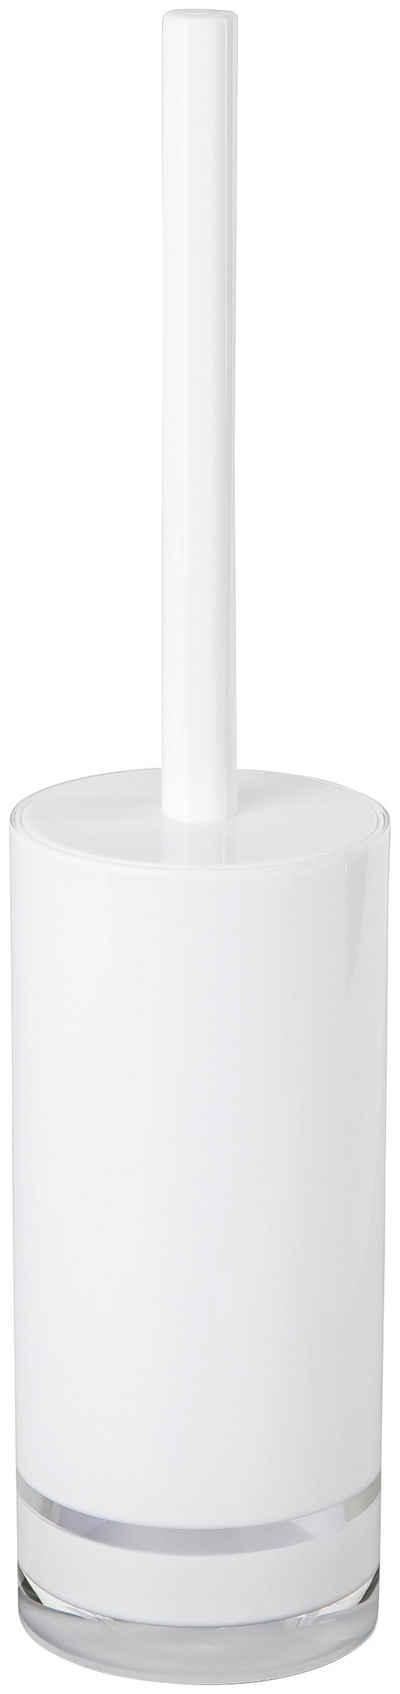 WC-Reinigungsbürste »Line«, Möve, aus hochwertigem Acrylglas